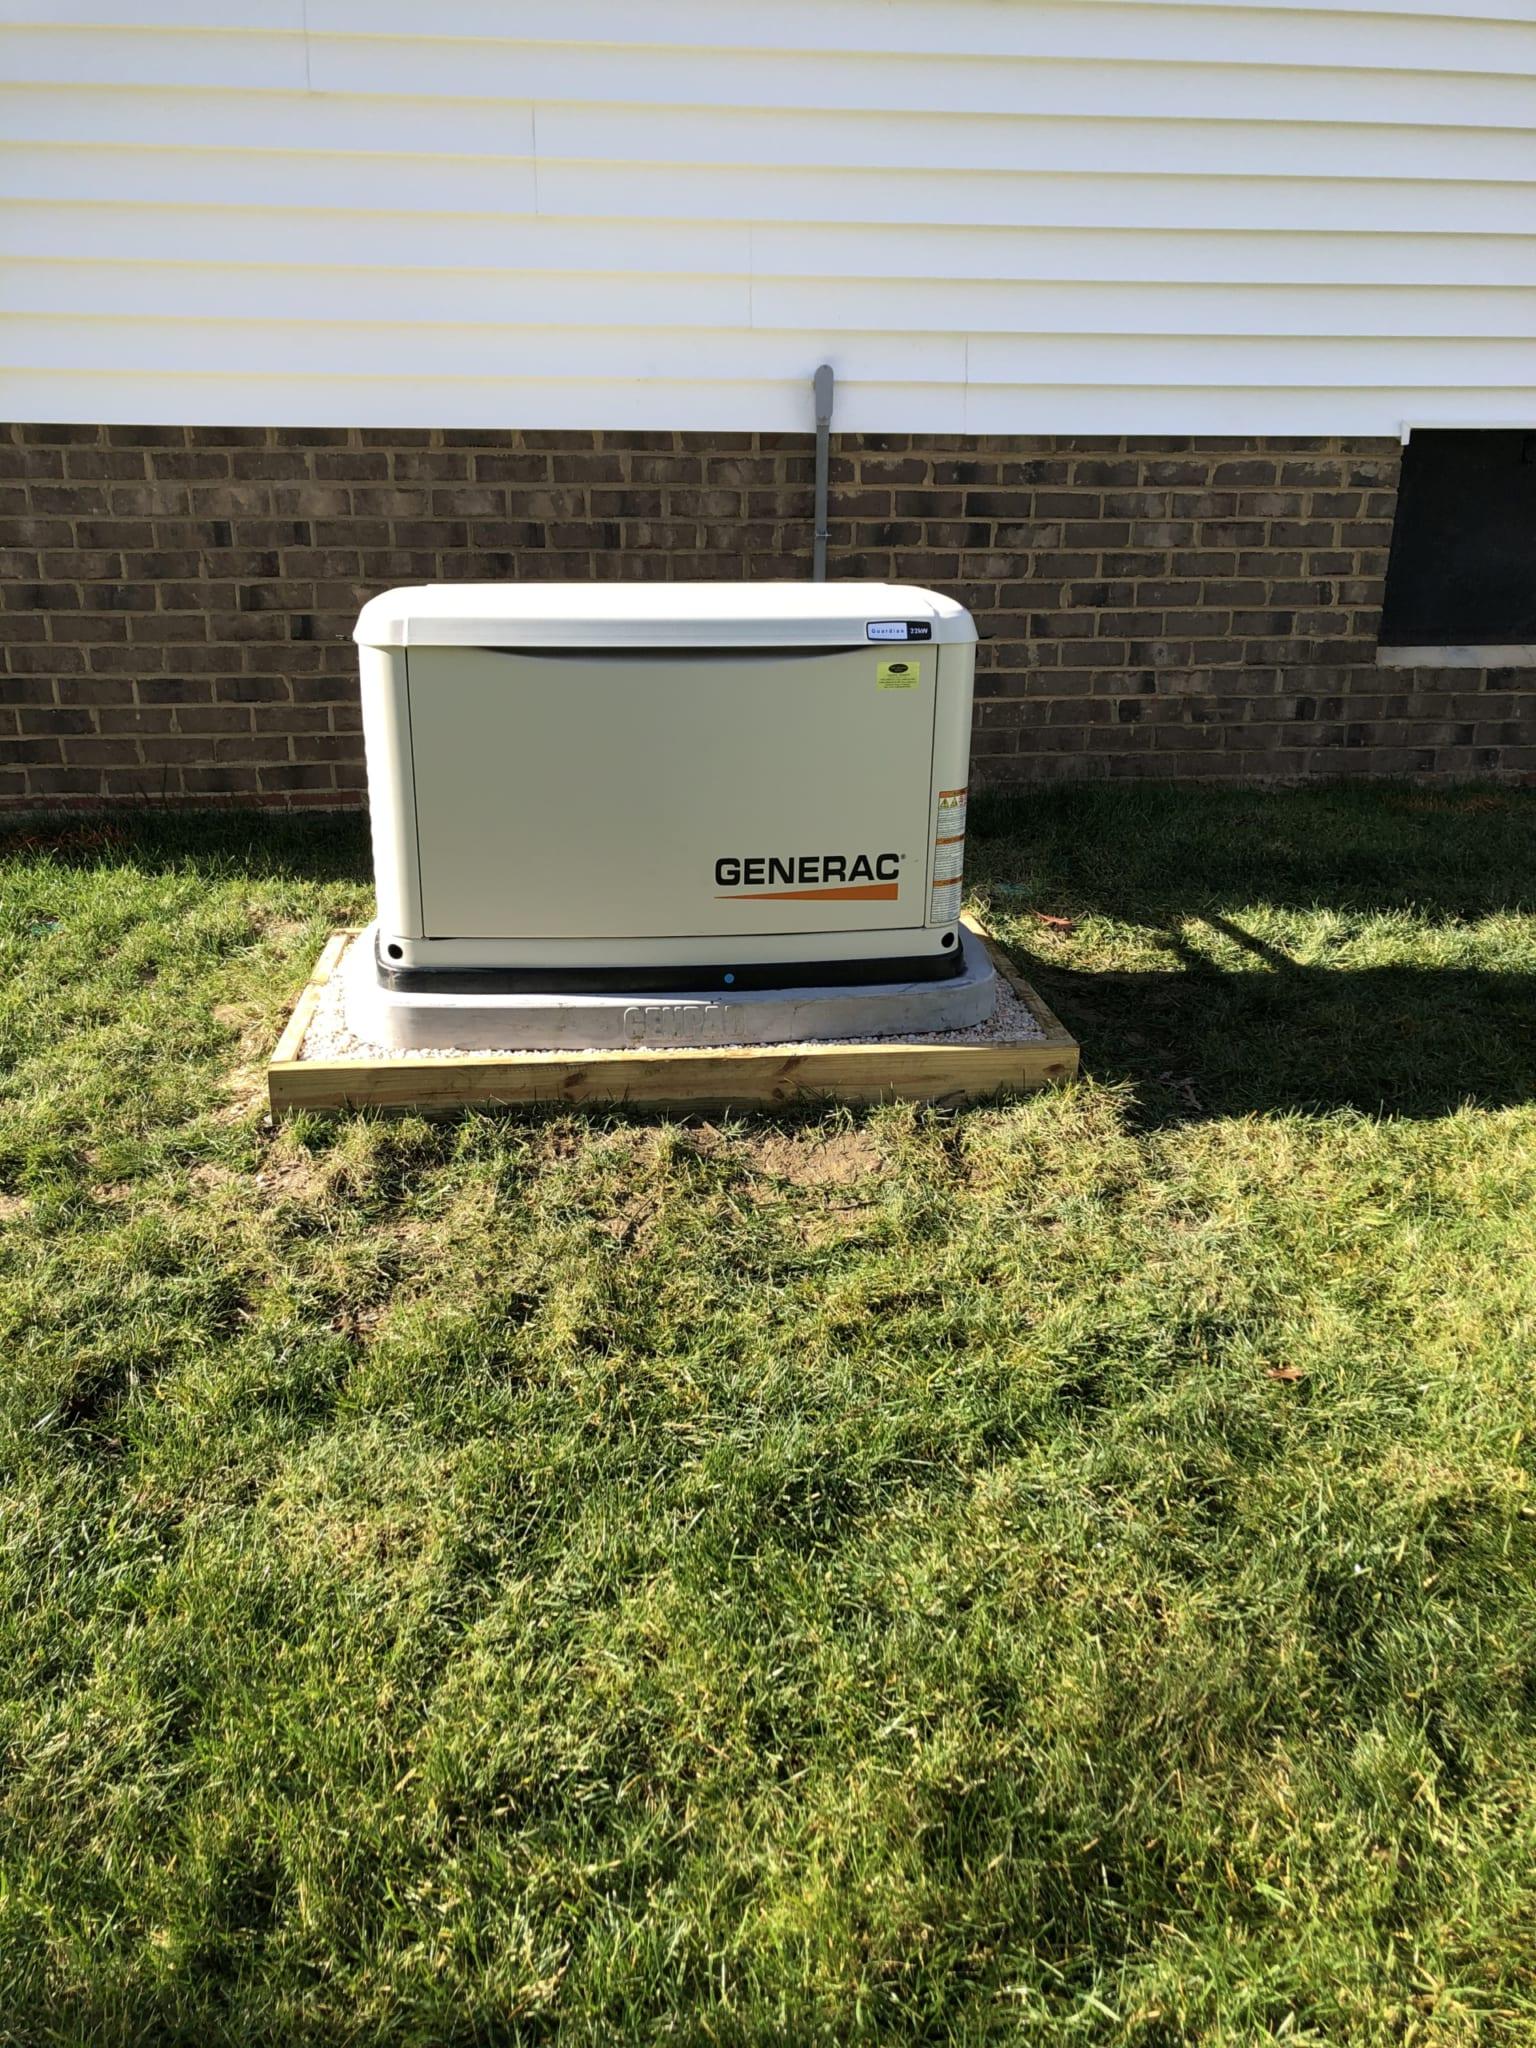 12.15.20 Chesterfield Generac Automatic Standby Generator